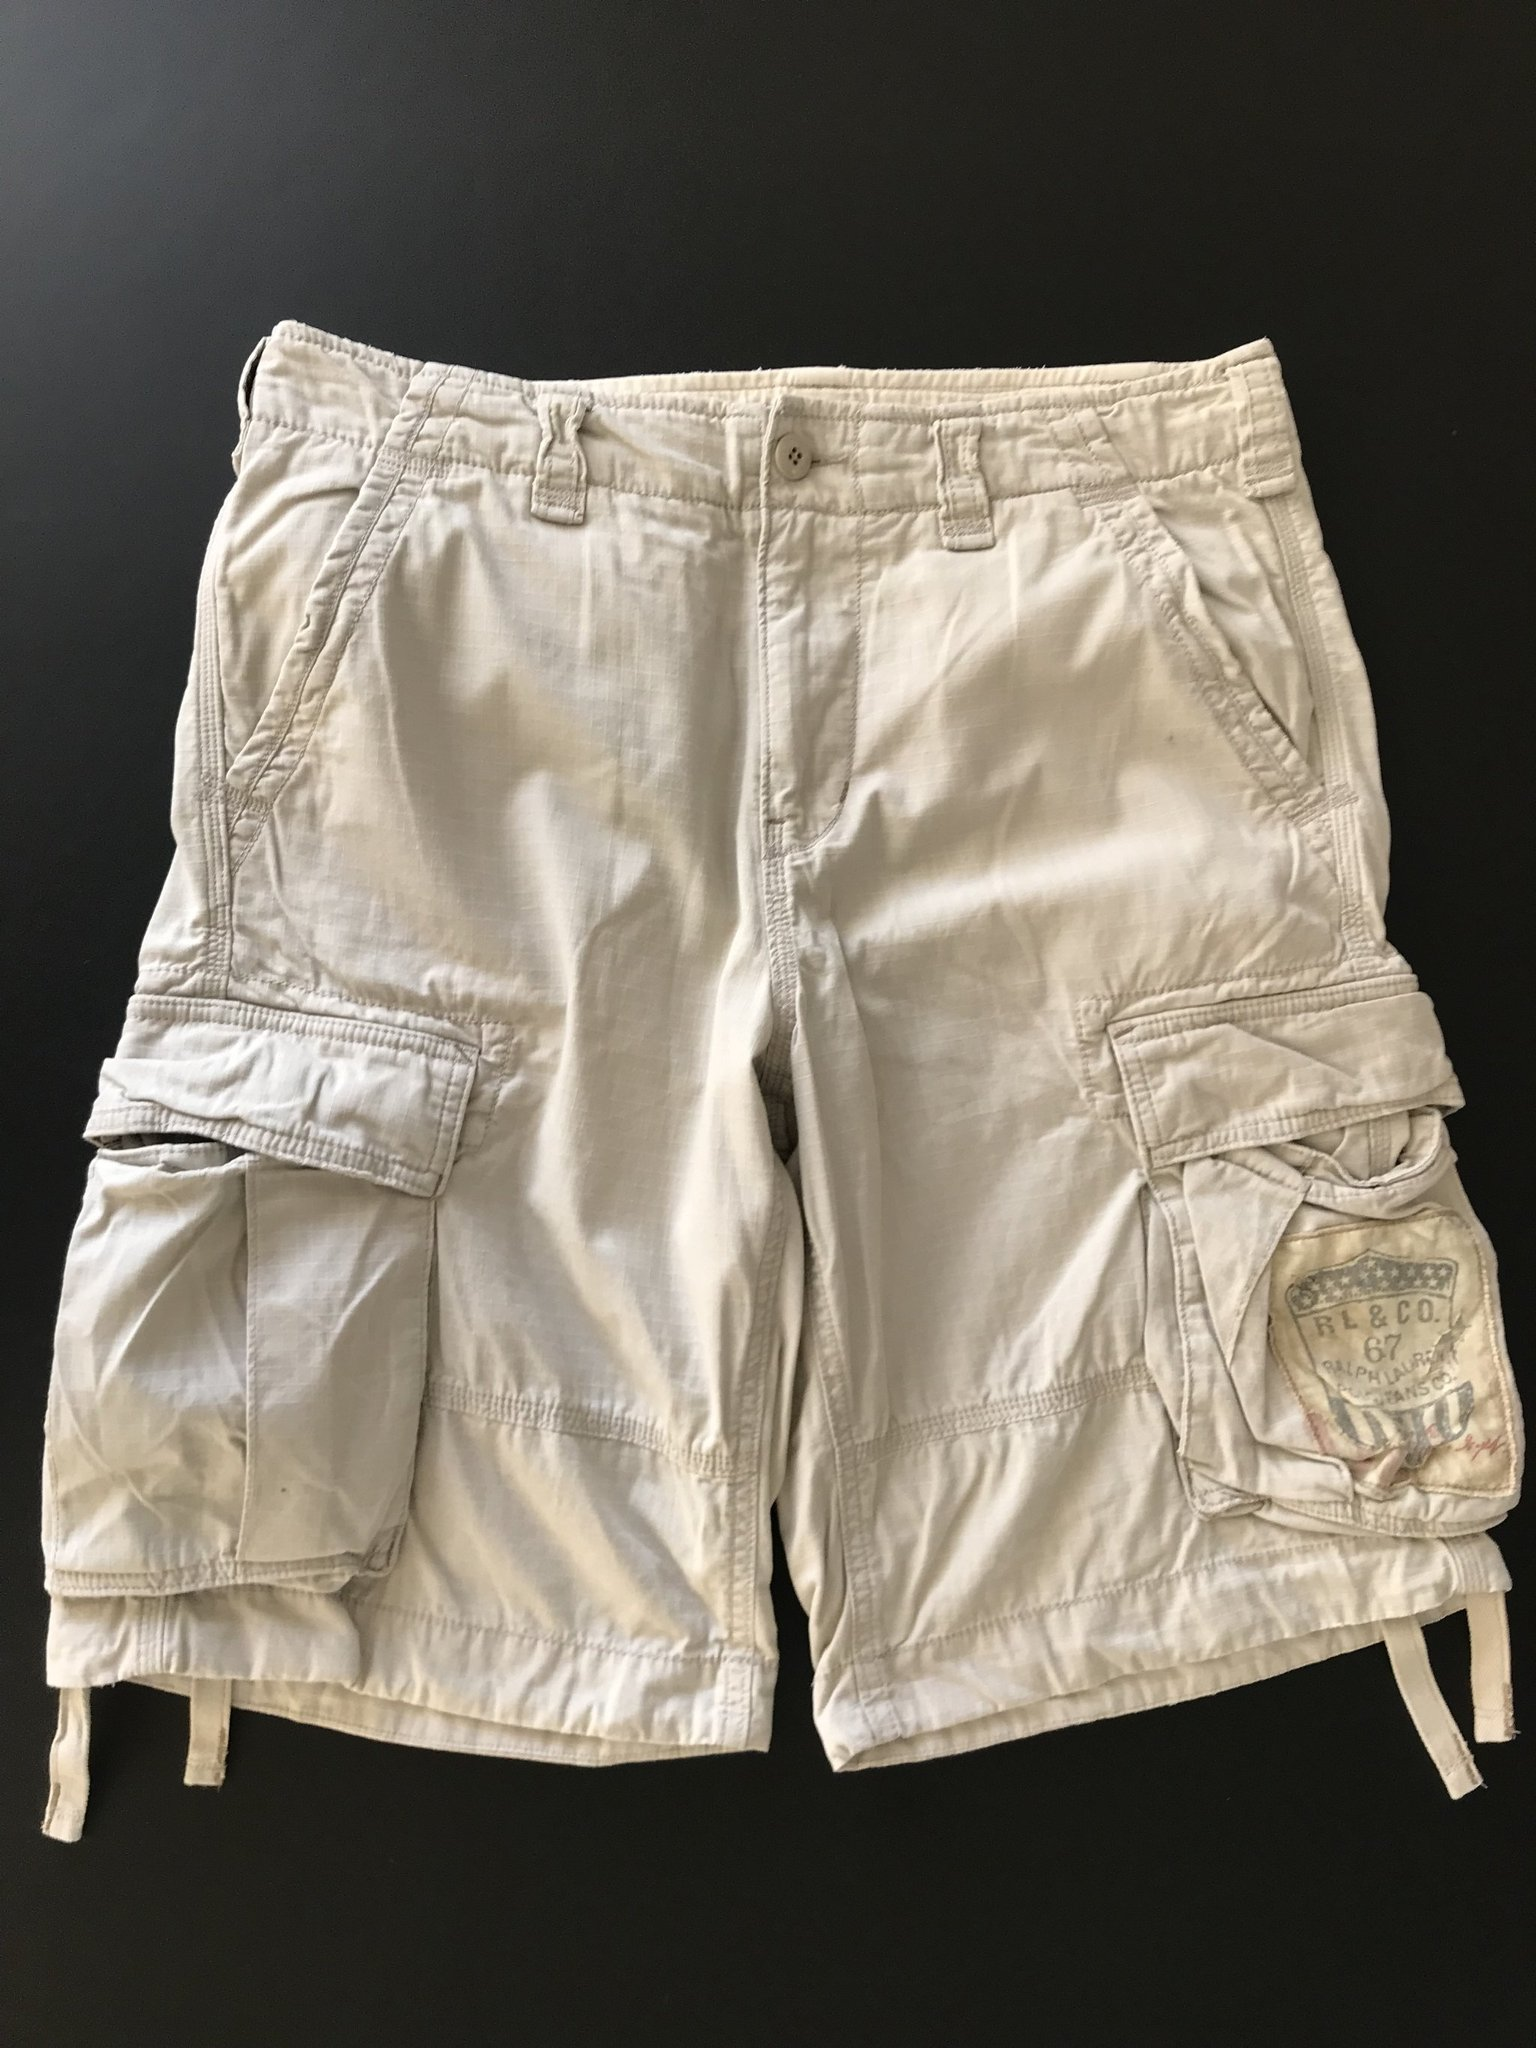 f652bce04abe Ralph Lauren Cargo Shorts Storlek 33 Ljusbeige (356065450) ᐈ Köp på ...